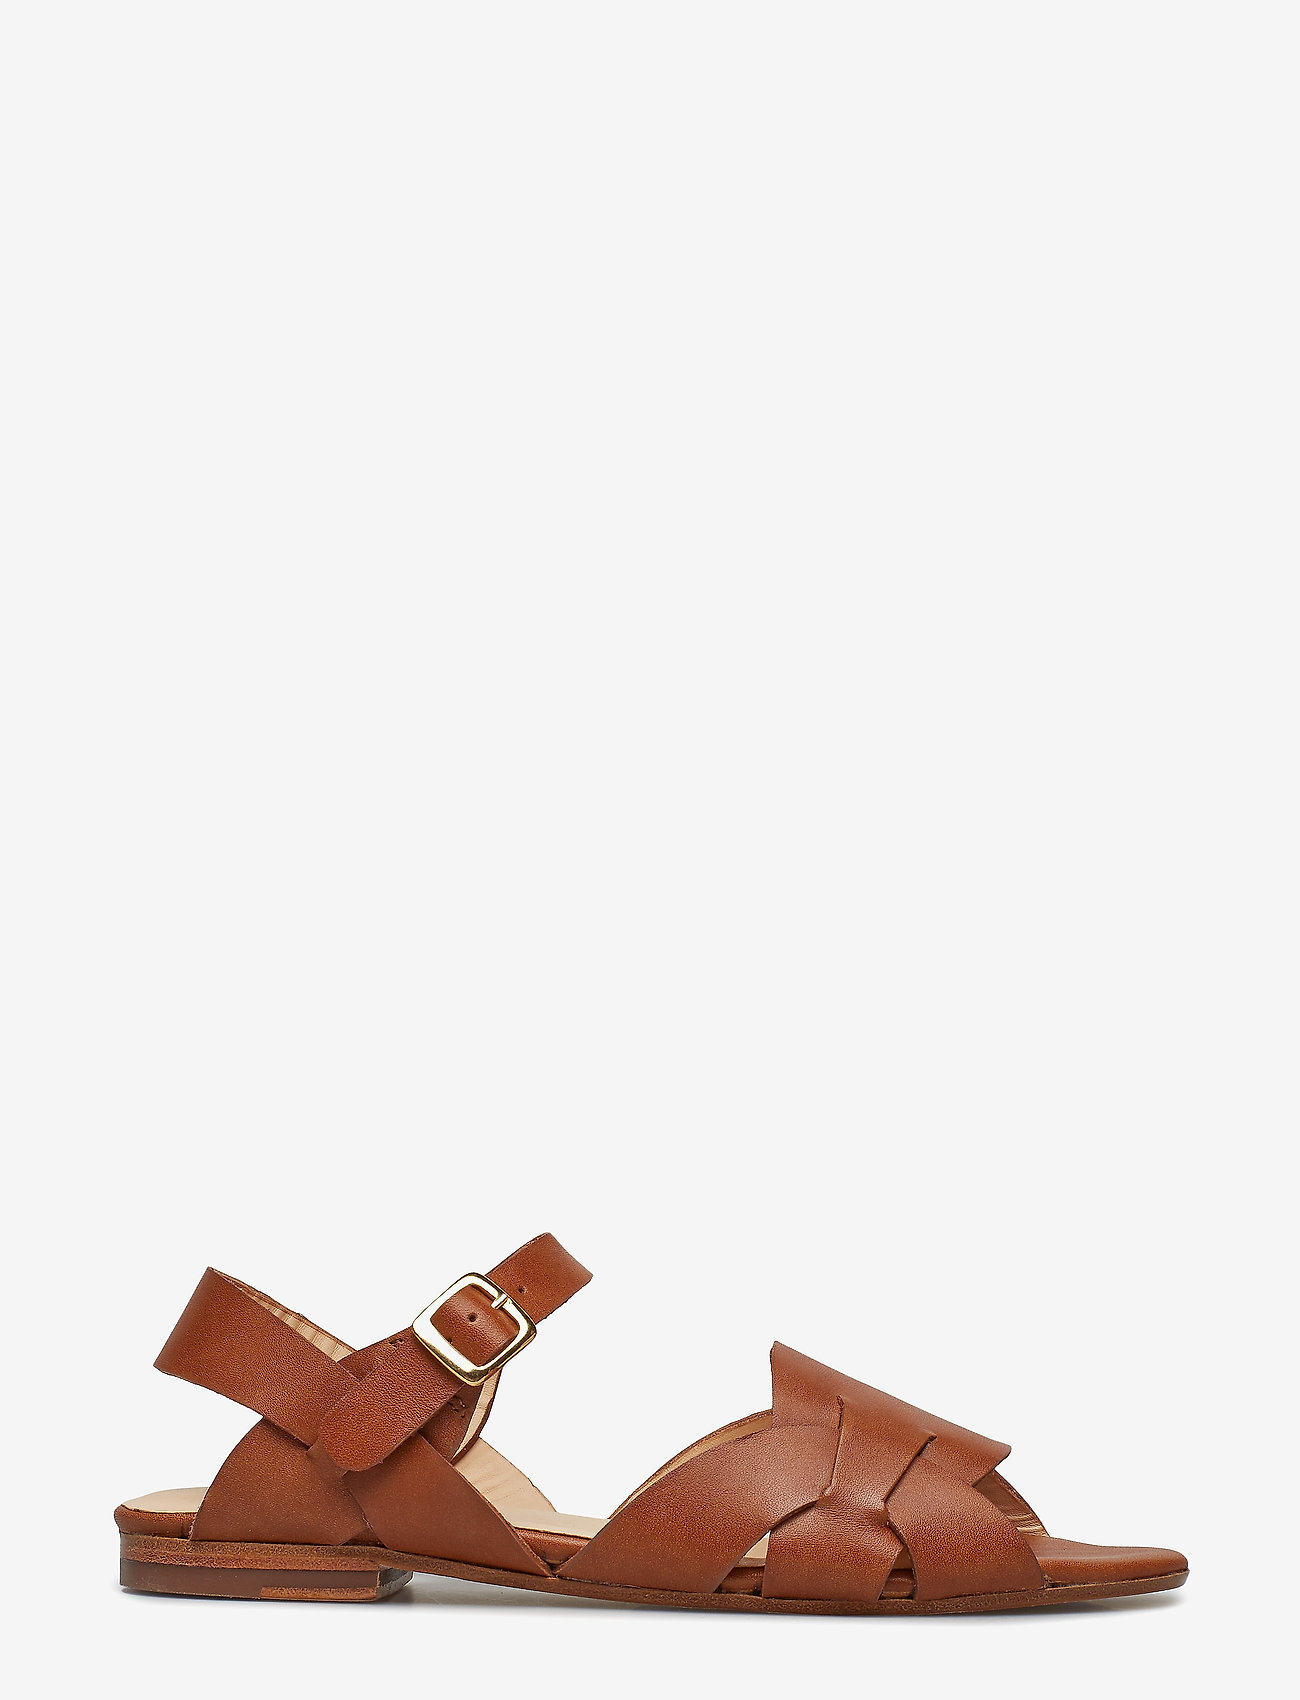 ANGULUS - Sandals - flat - flache sandalen - 1789 tan - 1